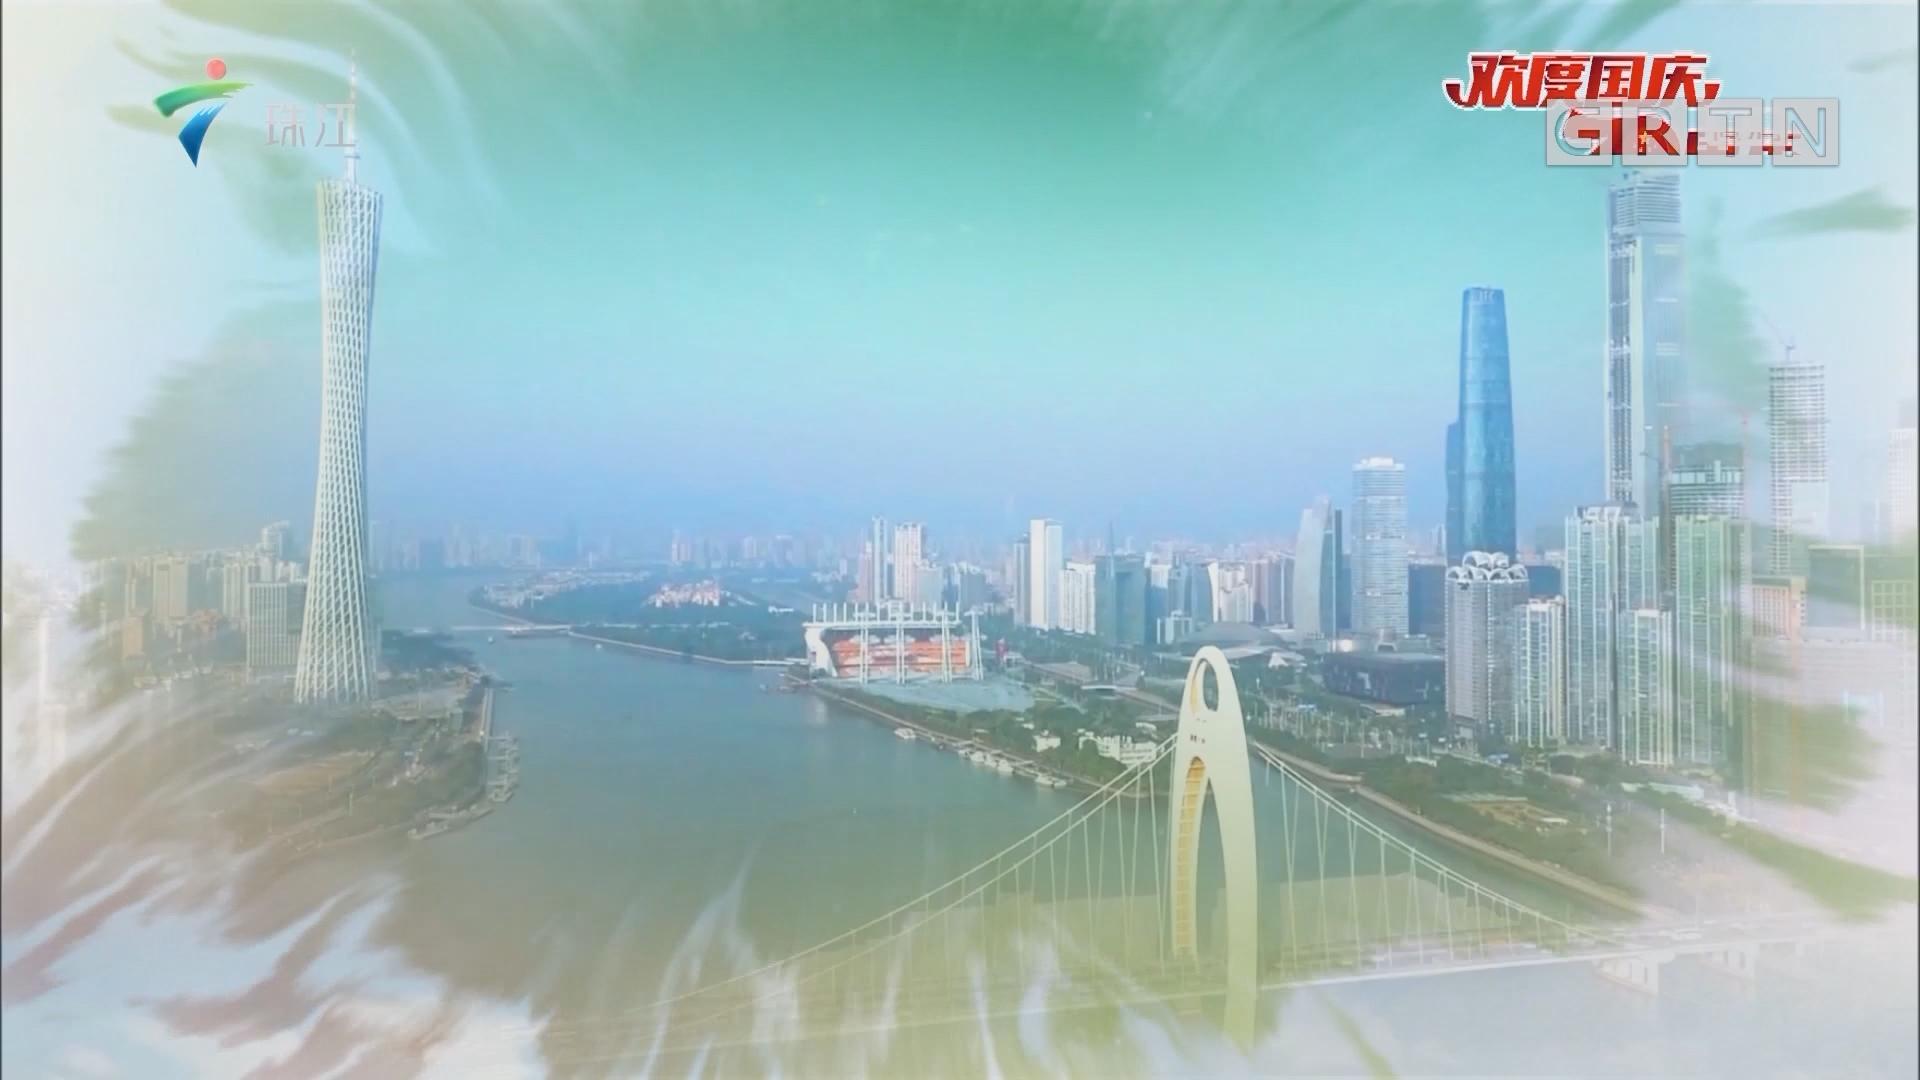 [HD][2019-09-28]广东视窗:深圳宝安:打造具有中华文化特色的水环境主题公园